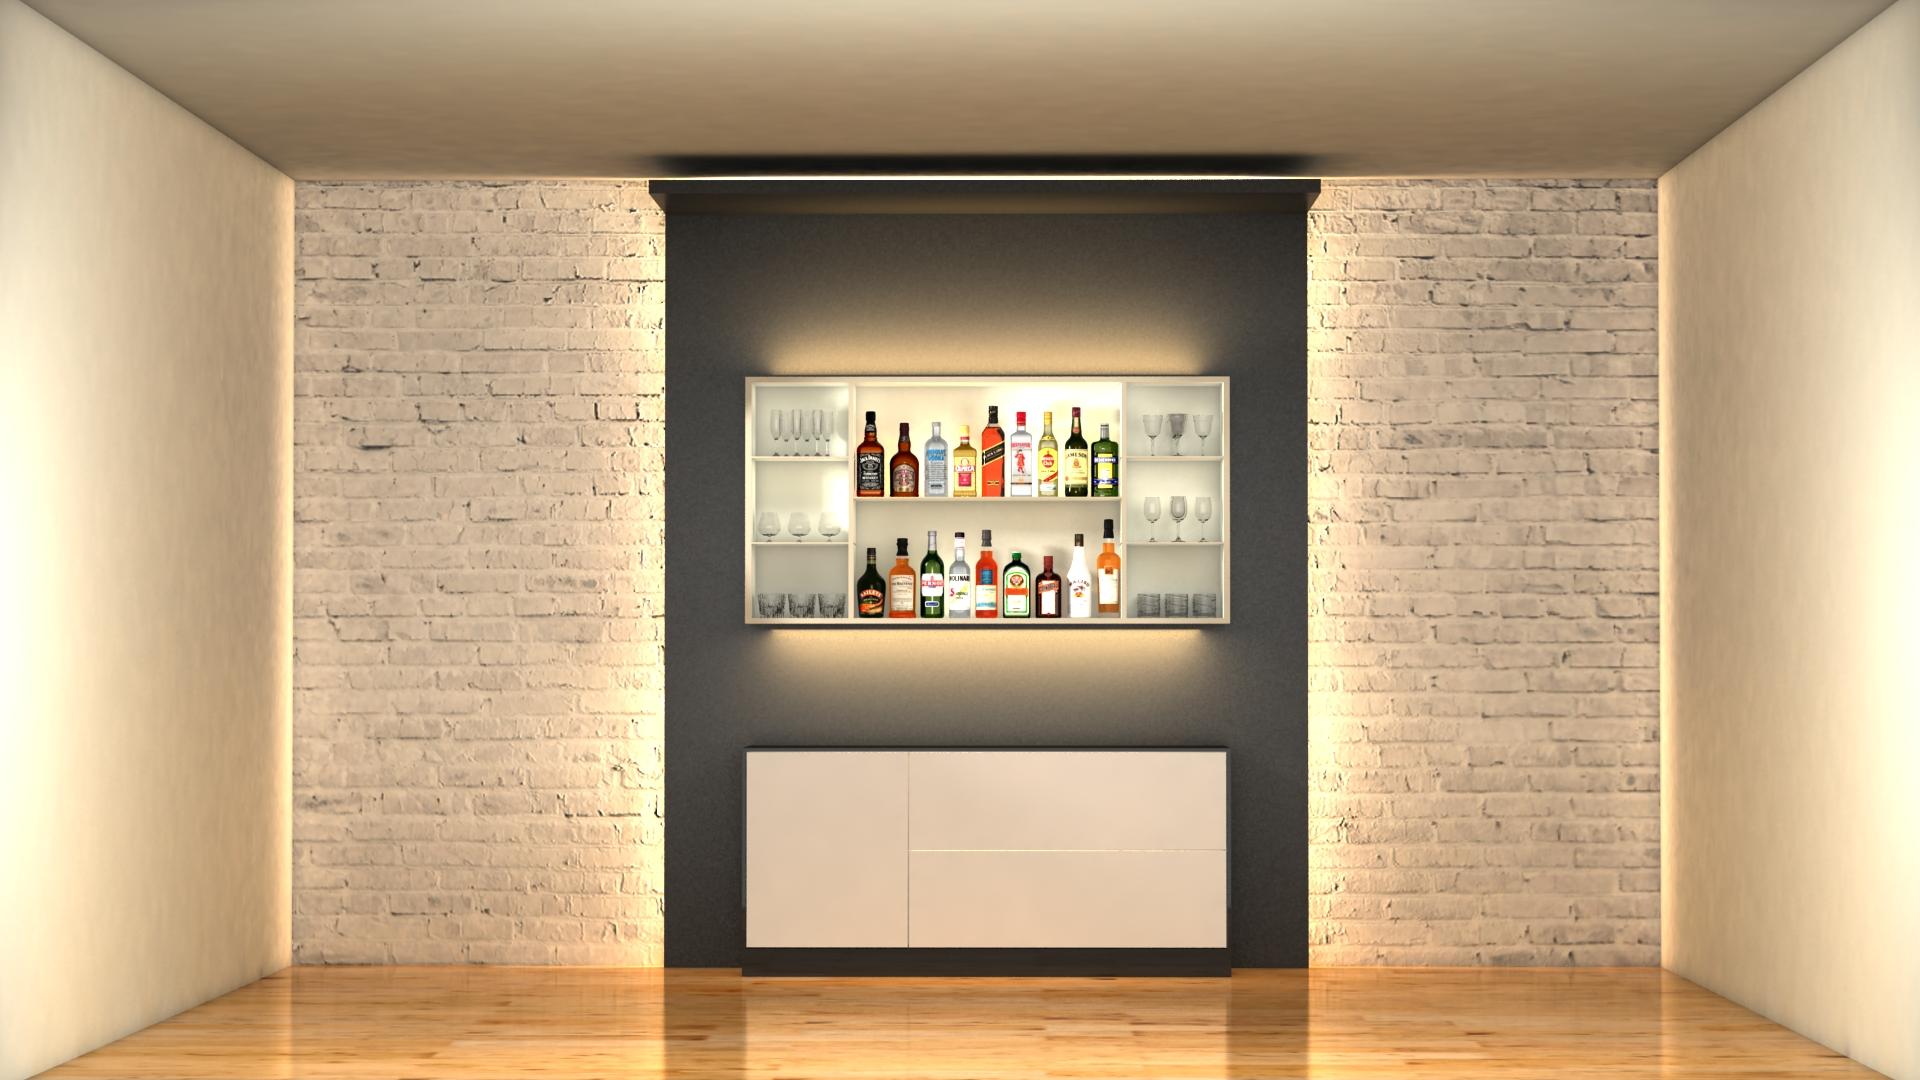 liquor bottles with bar unit interior vr/ar ready 3d model 3ds max  fbx jpeg jpg texture obj 279235